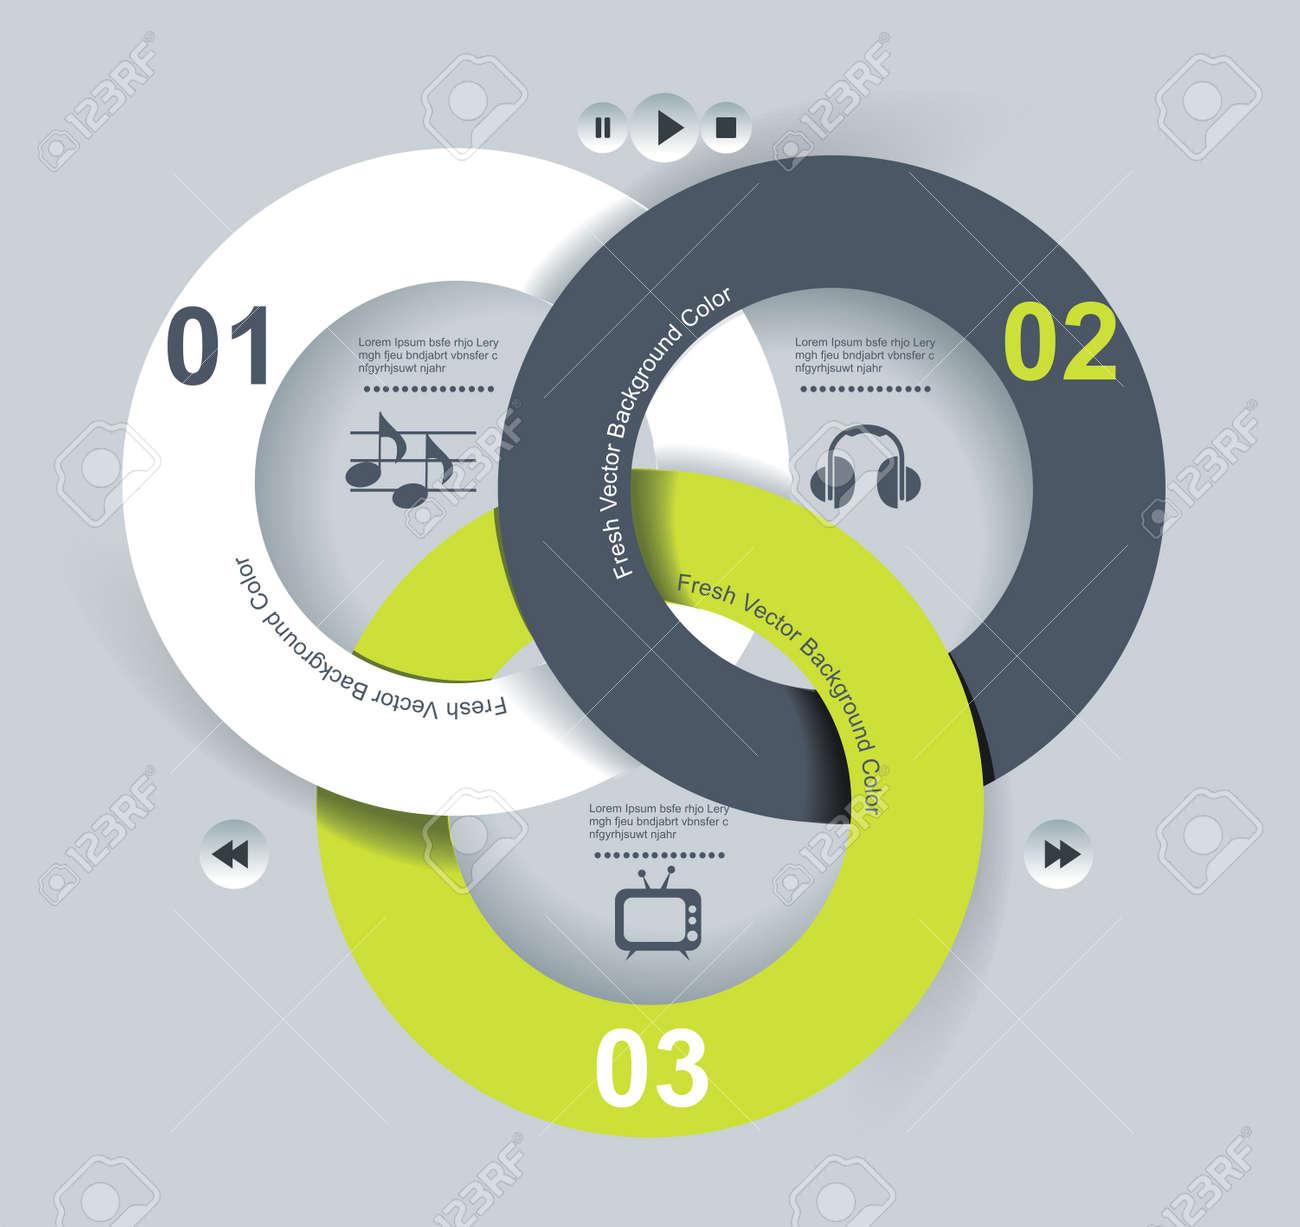 User interface template  Vector illustration Stock Vector - 20142190